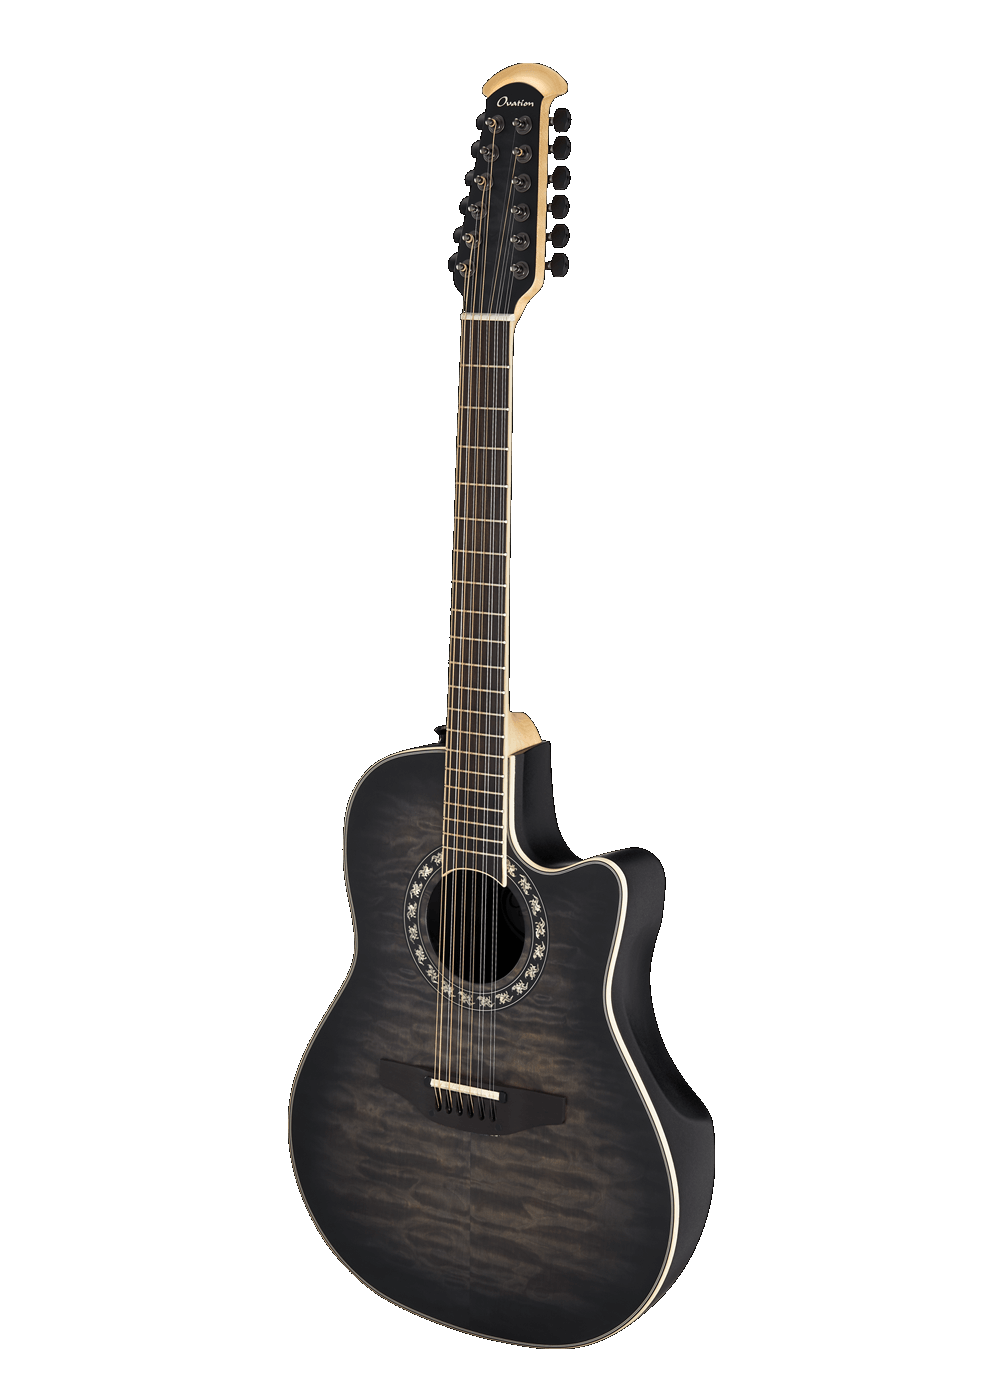 Ovation C2059AXP2-5S ExoticWood Legend 12-String Acoustic Guitar - Black Satin